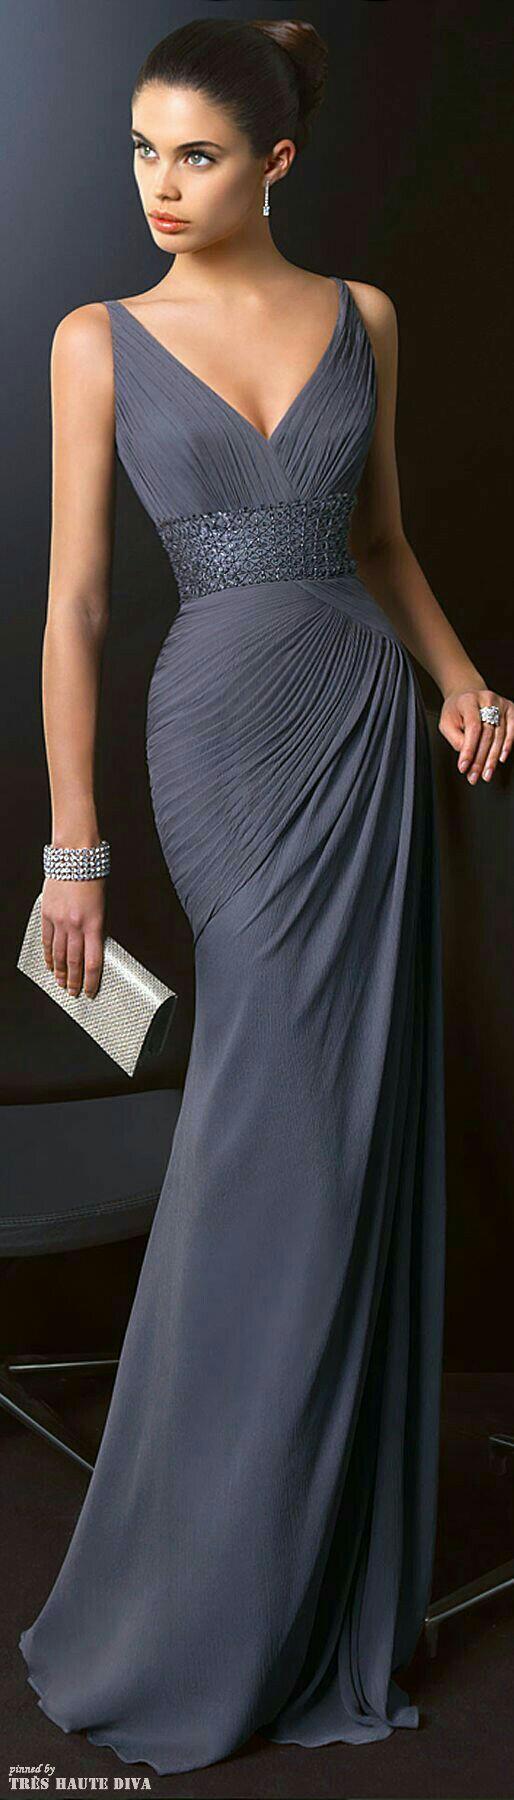 Pin by Melissa on Simply elegant Pinterest Gray dress Elegant